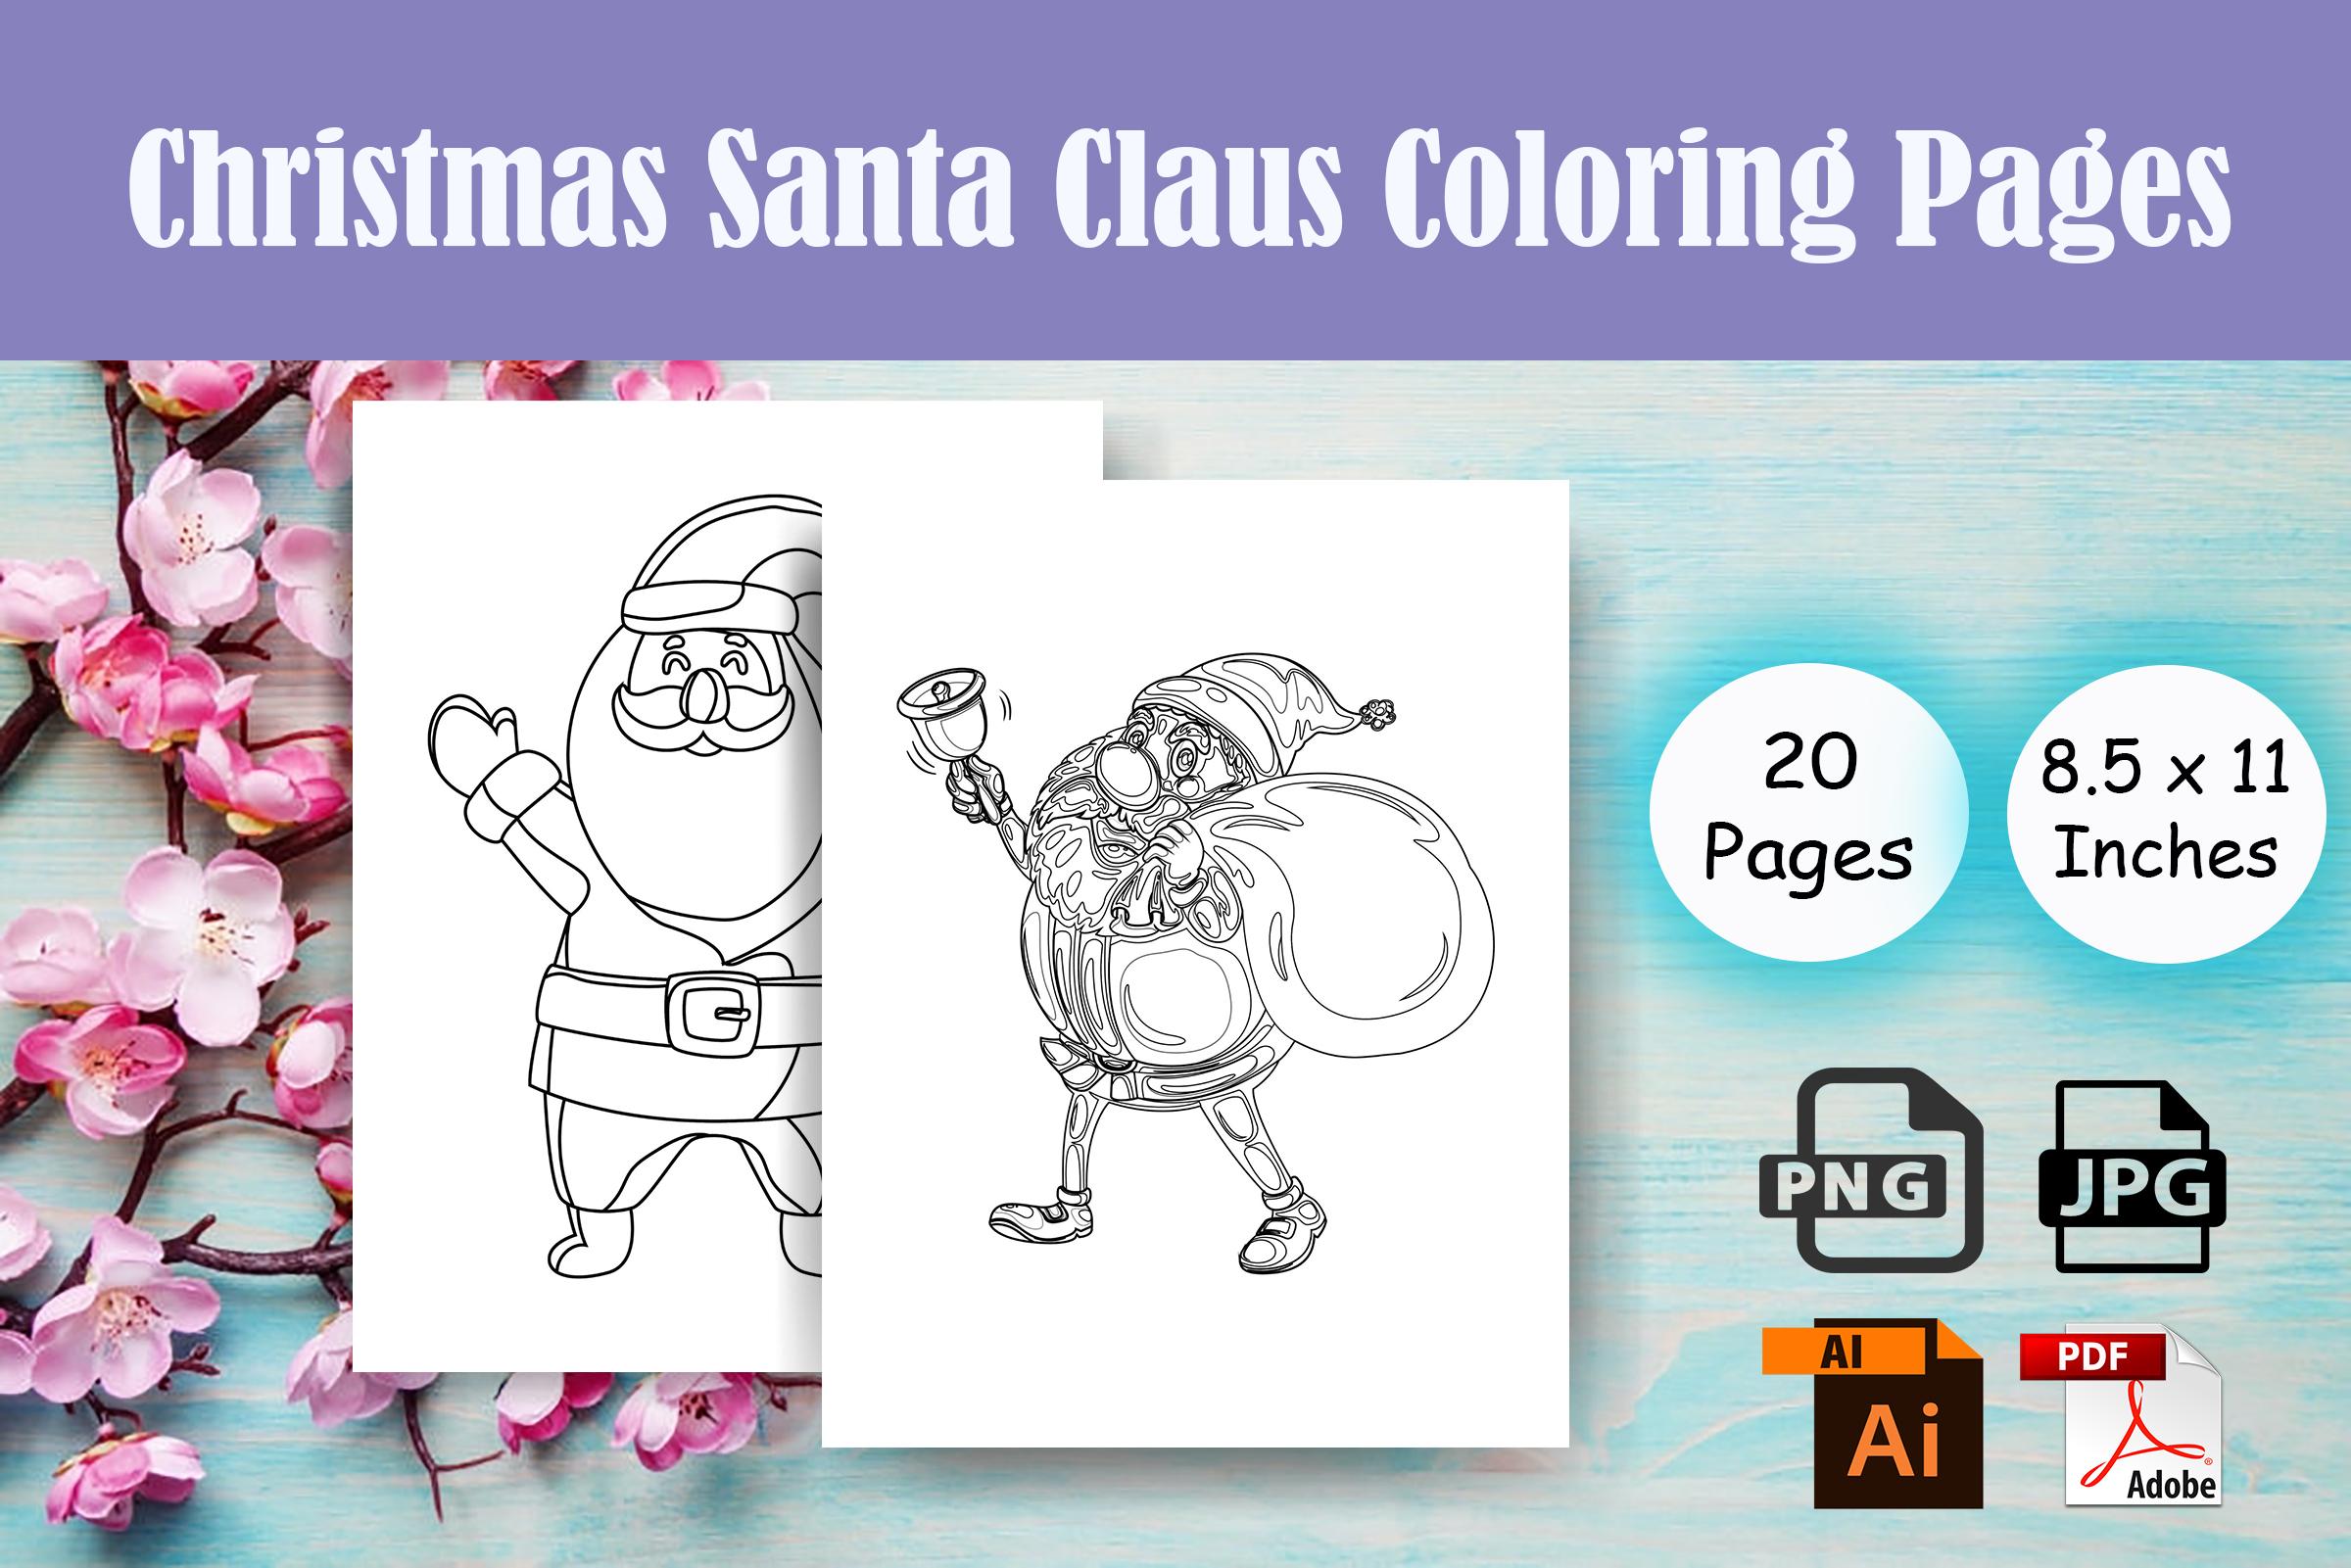 Christmas Santa Claus Coloring Page Kdp Graphic By Sei Ripan Creative Fabrica